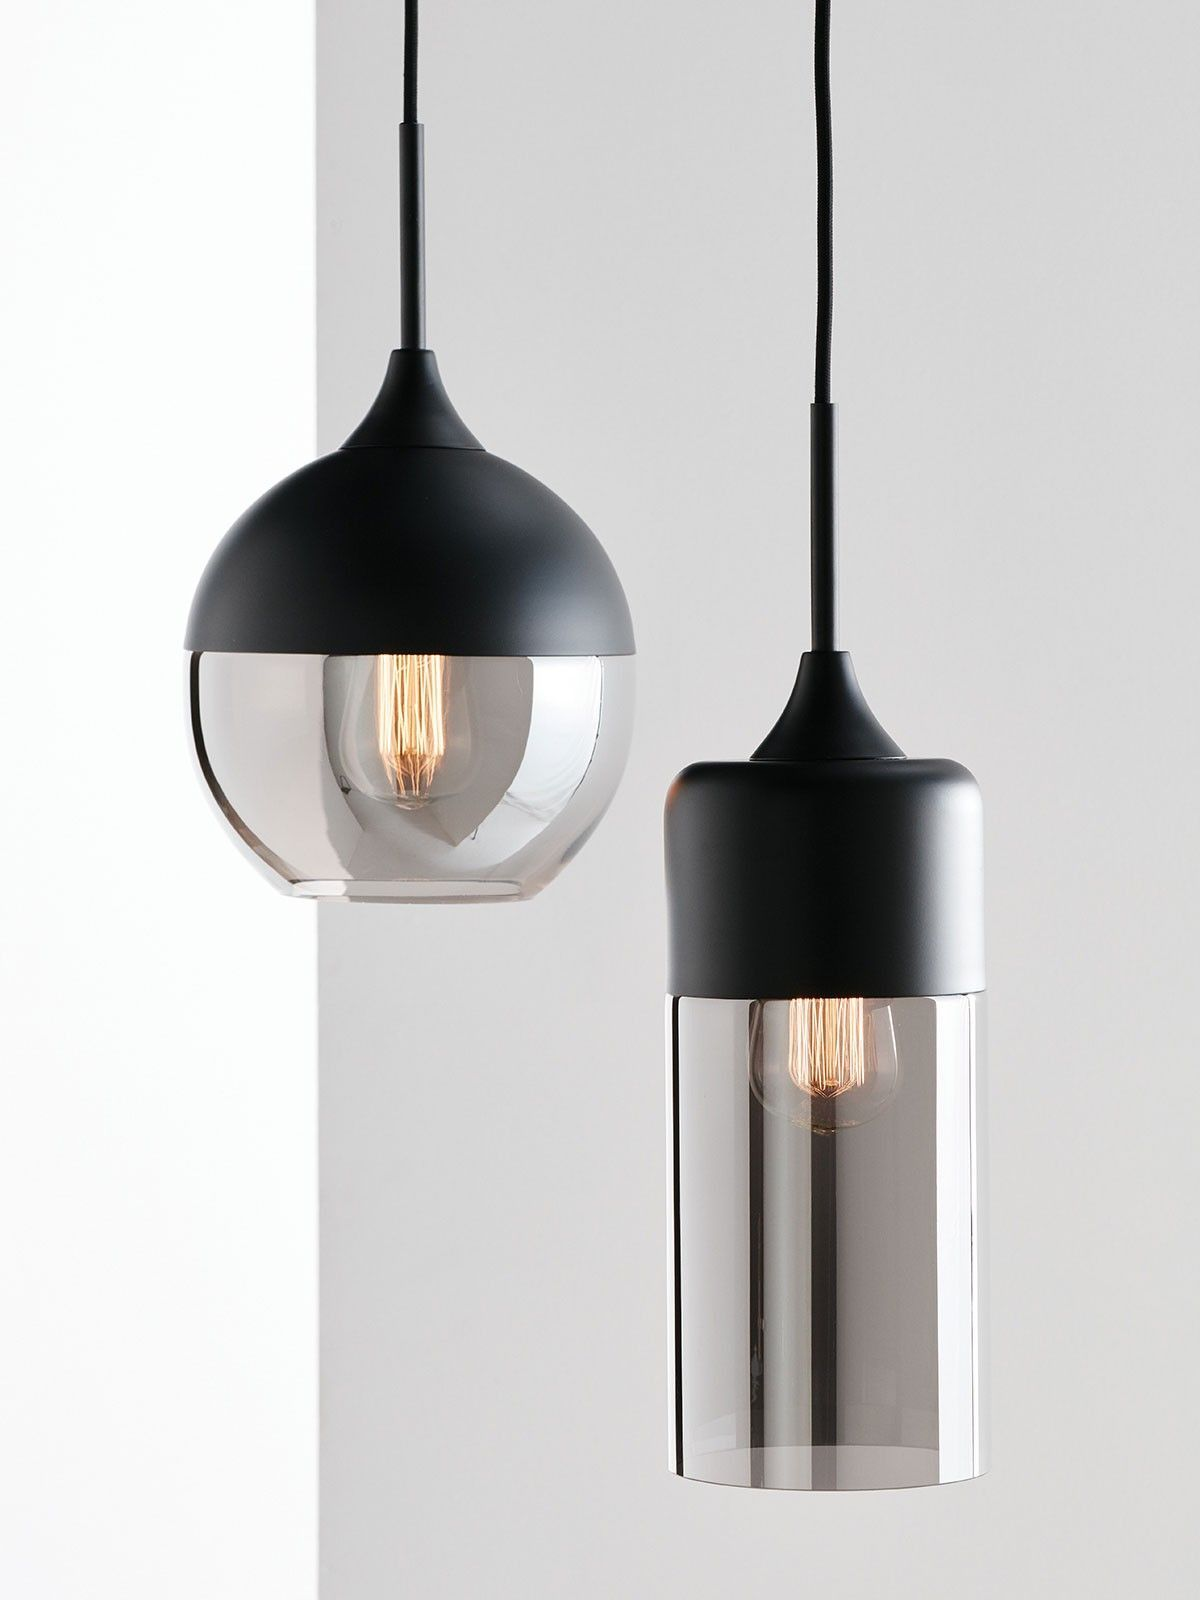 Lunar 1 Light Round Pendant In Black Smoke Bathroom Pendant Lighting Bathroom Light Fixtures Contemporary Lighting